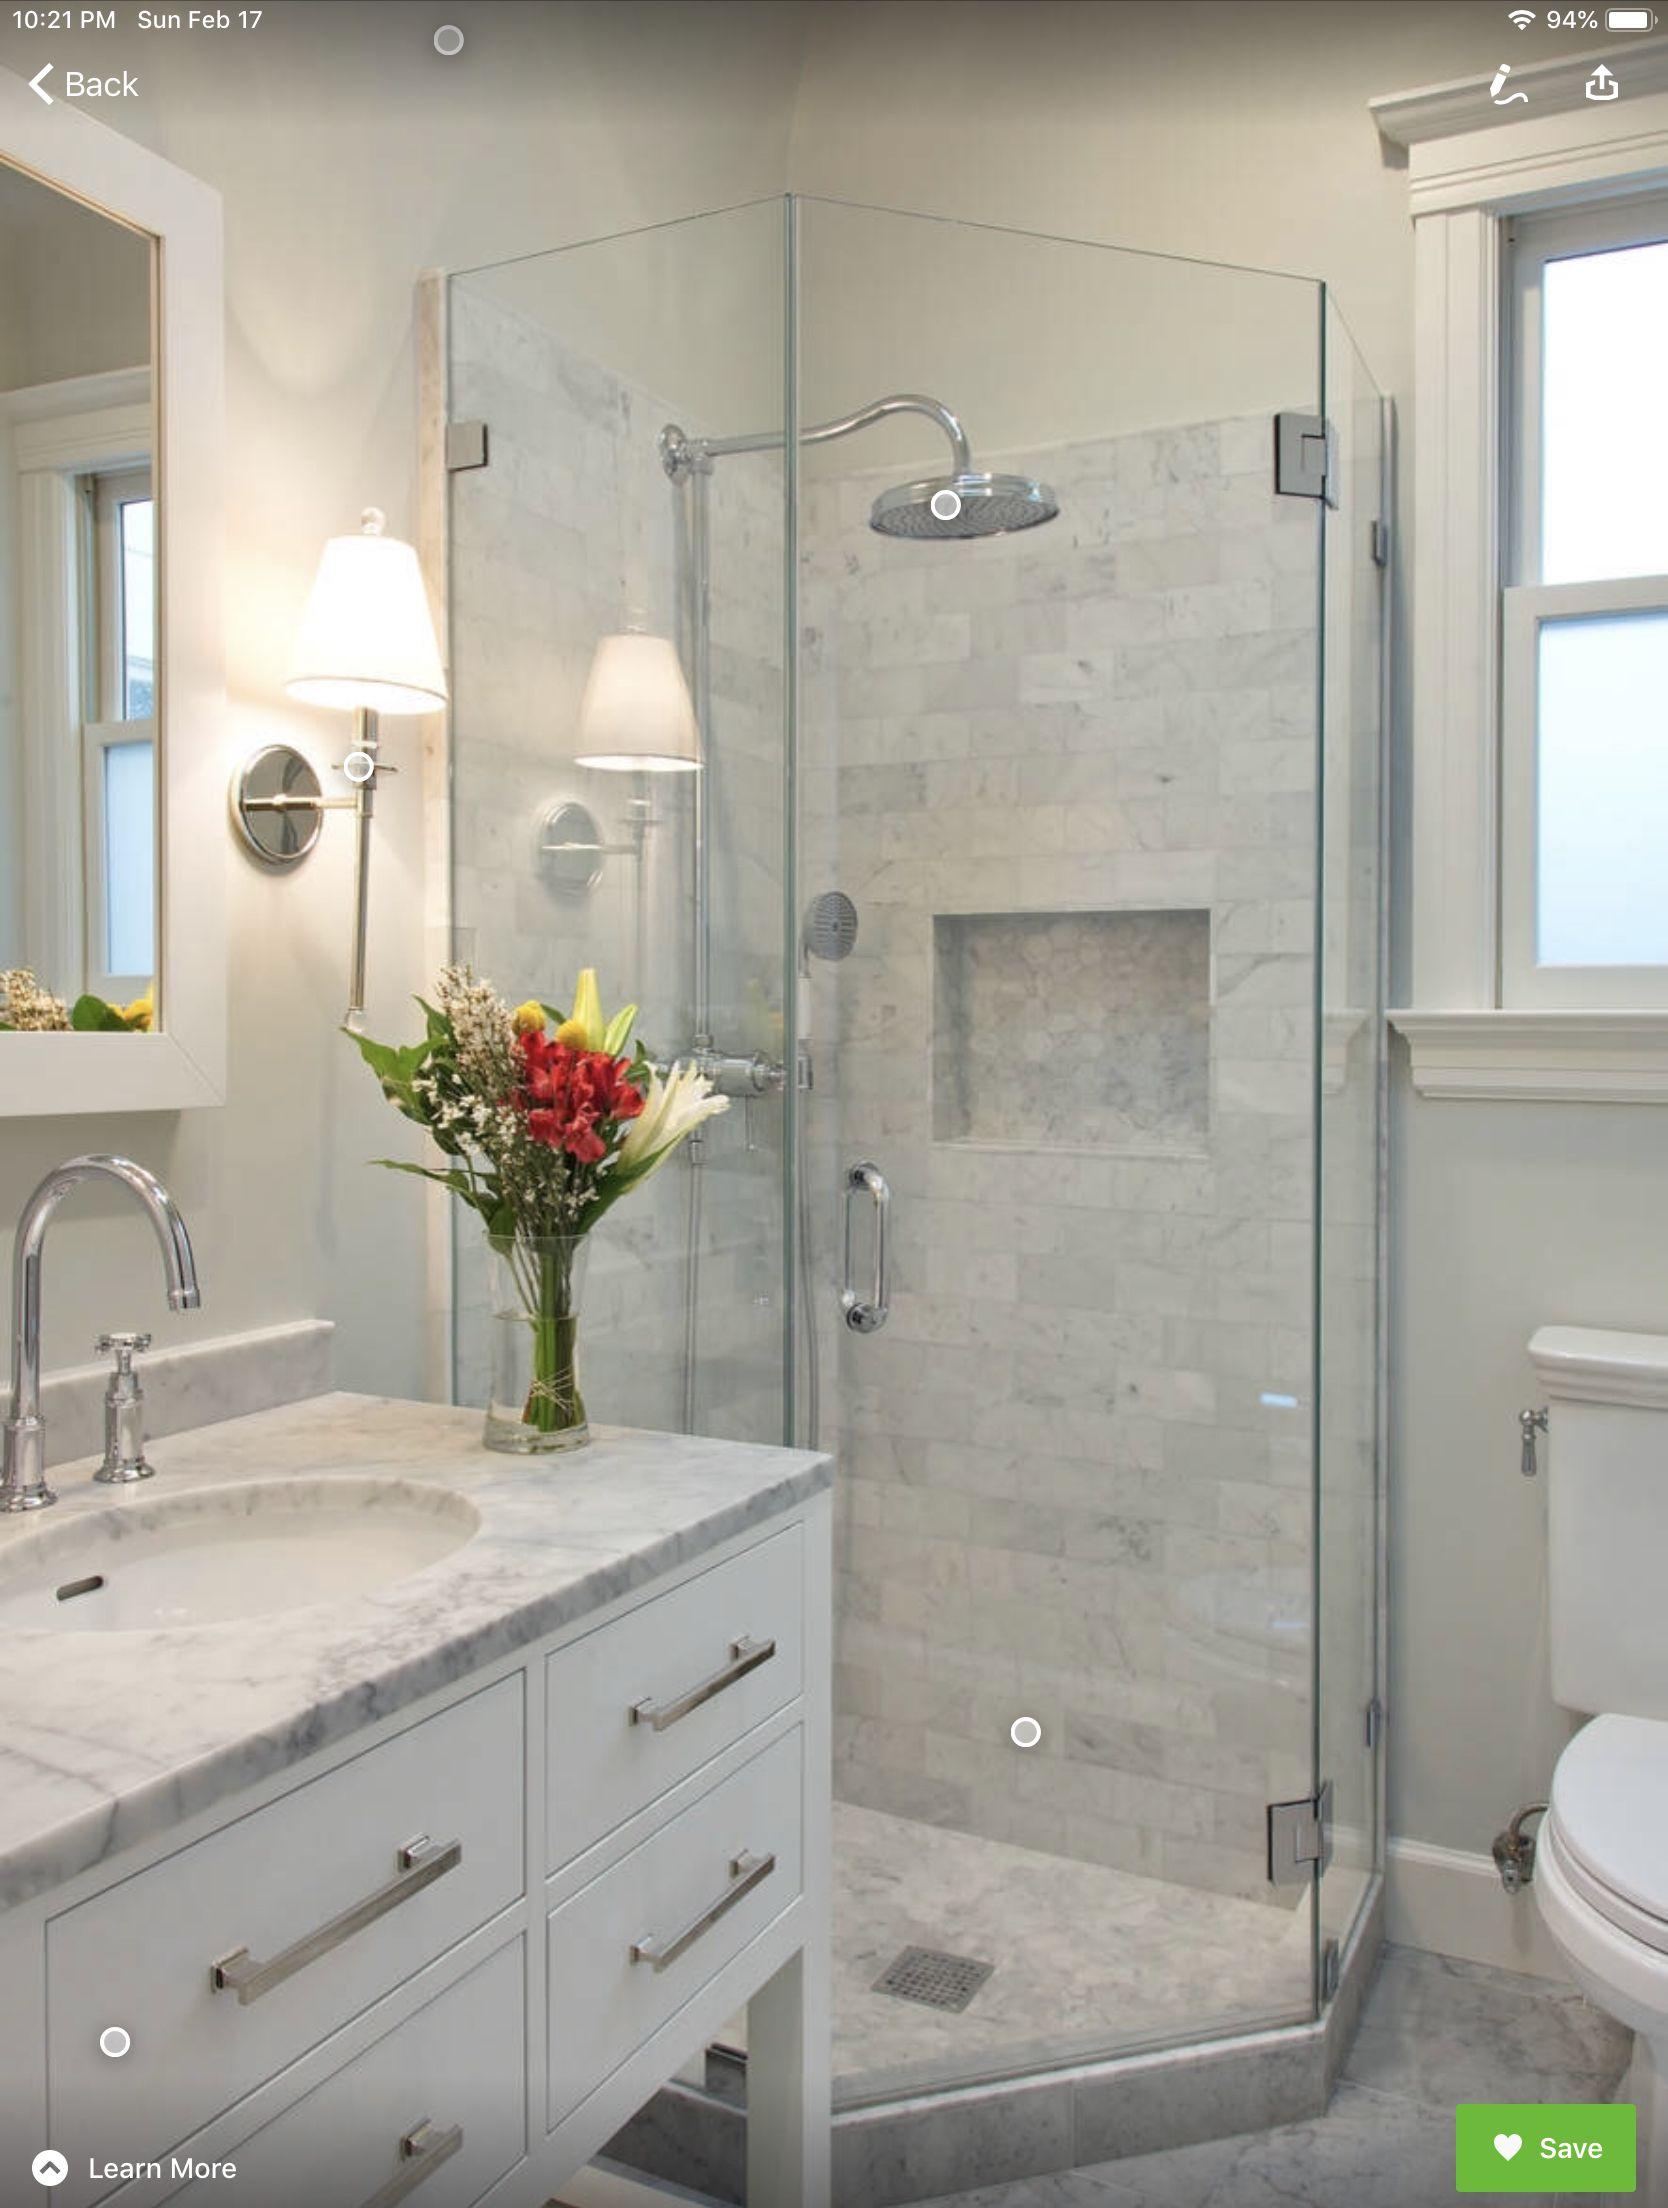 Pin by ravensfan24 on Bathroom | Restroom remodel, Cheap ...